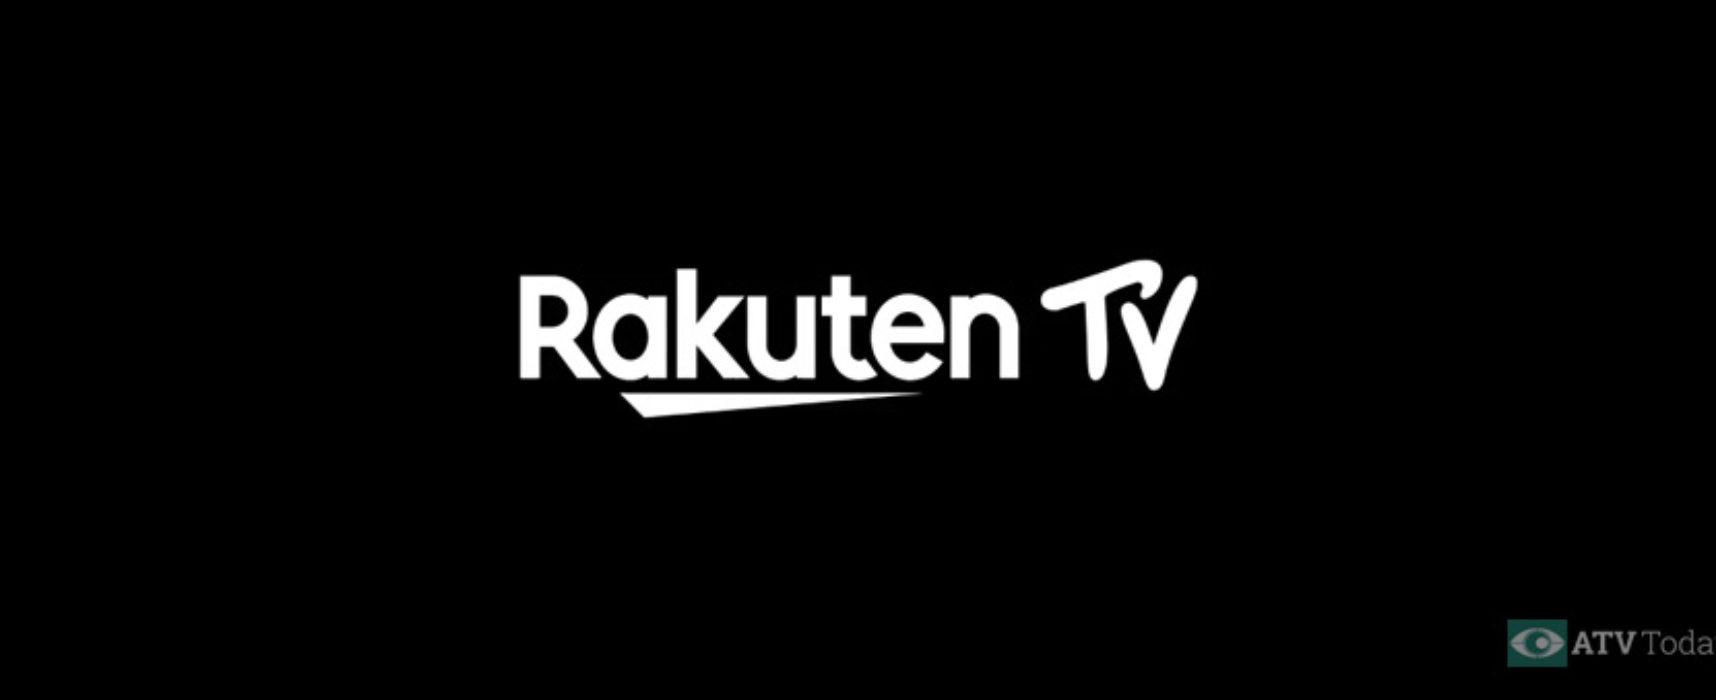 Rakuten TV March promo highlights